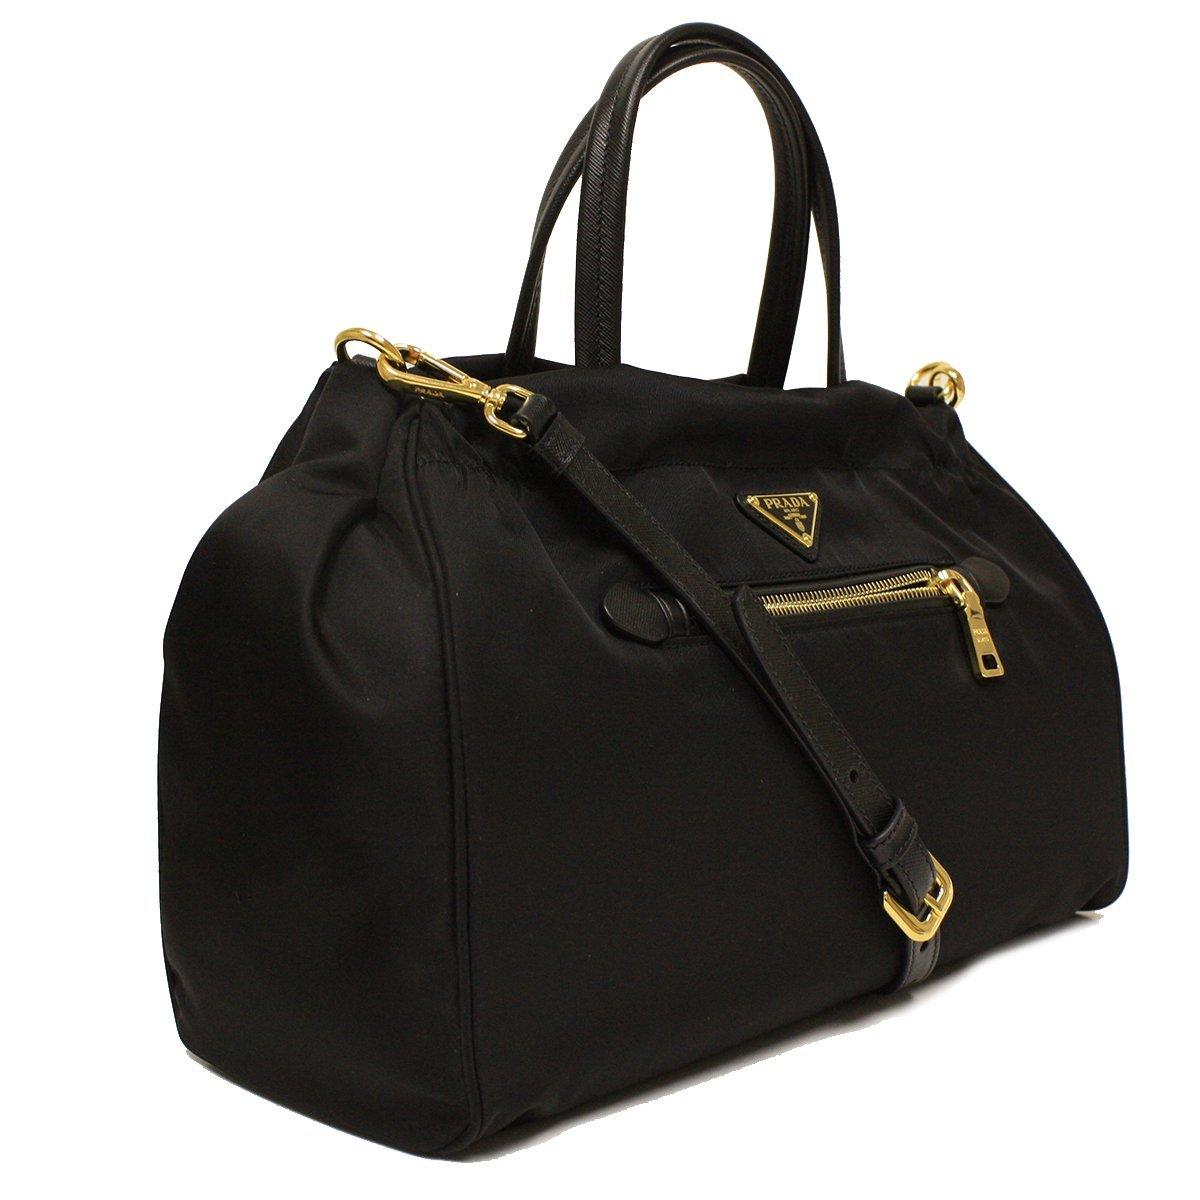 15541bfceb32 Amazon.com: Prada Tessuto Saffian Nylon and Leather Shopping Tote Bag  B1843M, Black / Nero: Shoes